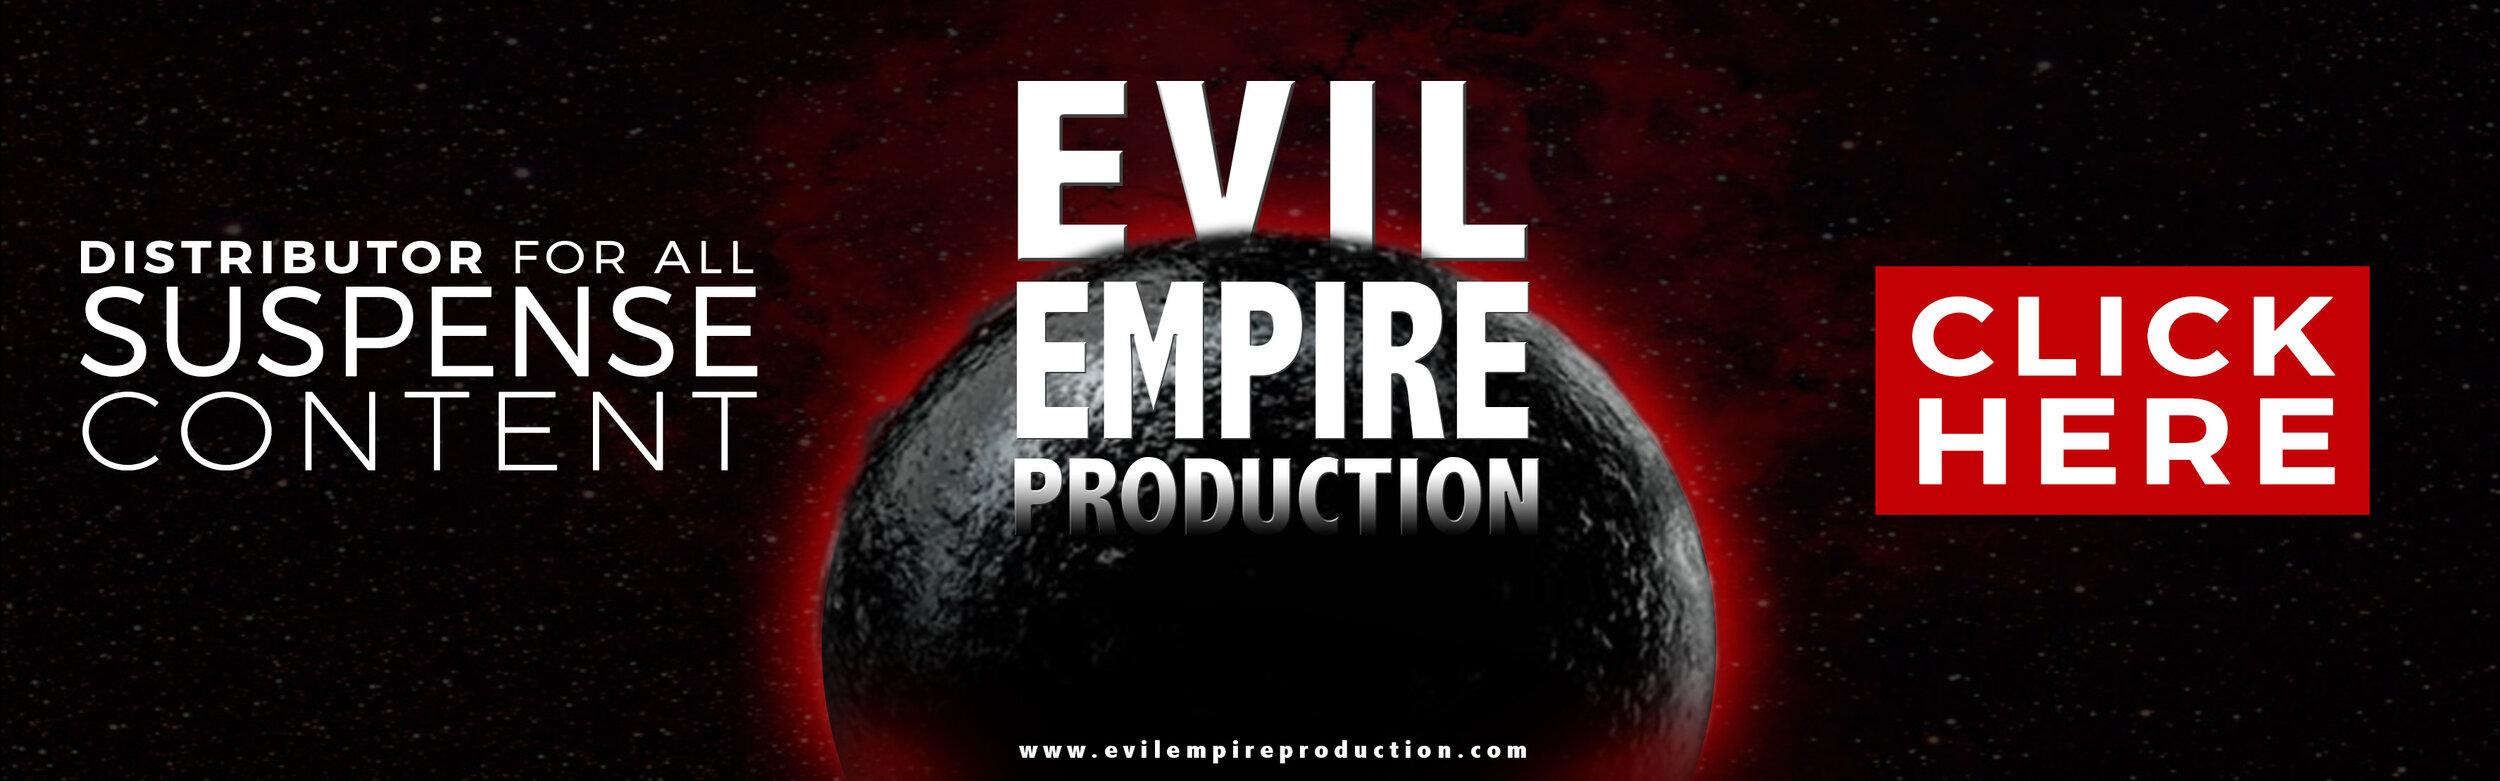 EEP-AD-SUPSENSE-wide-banner.jpg